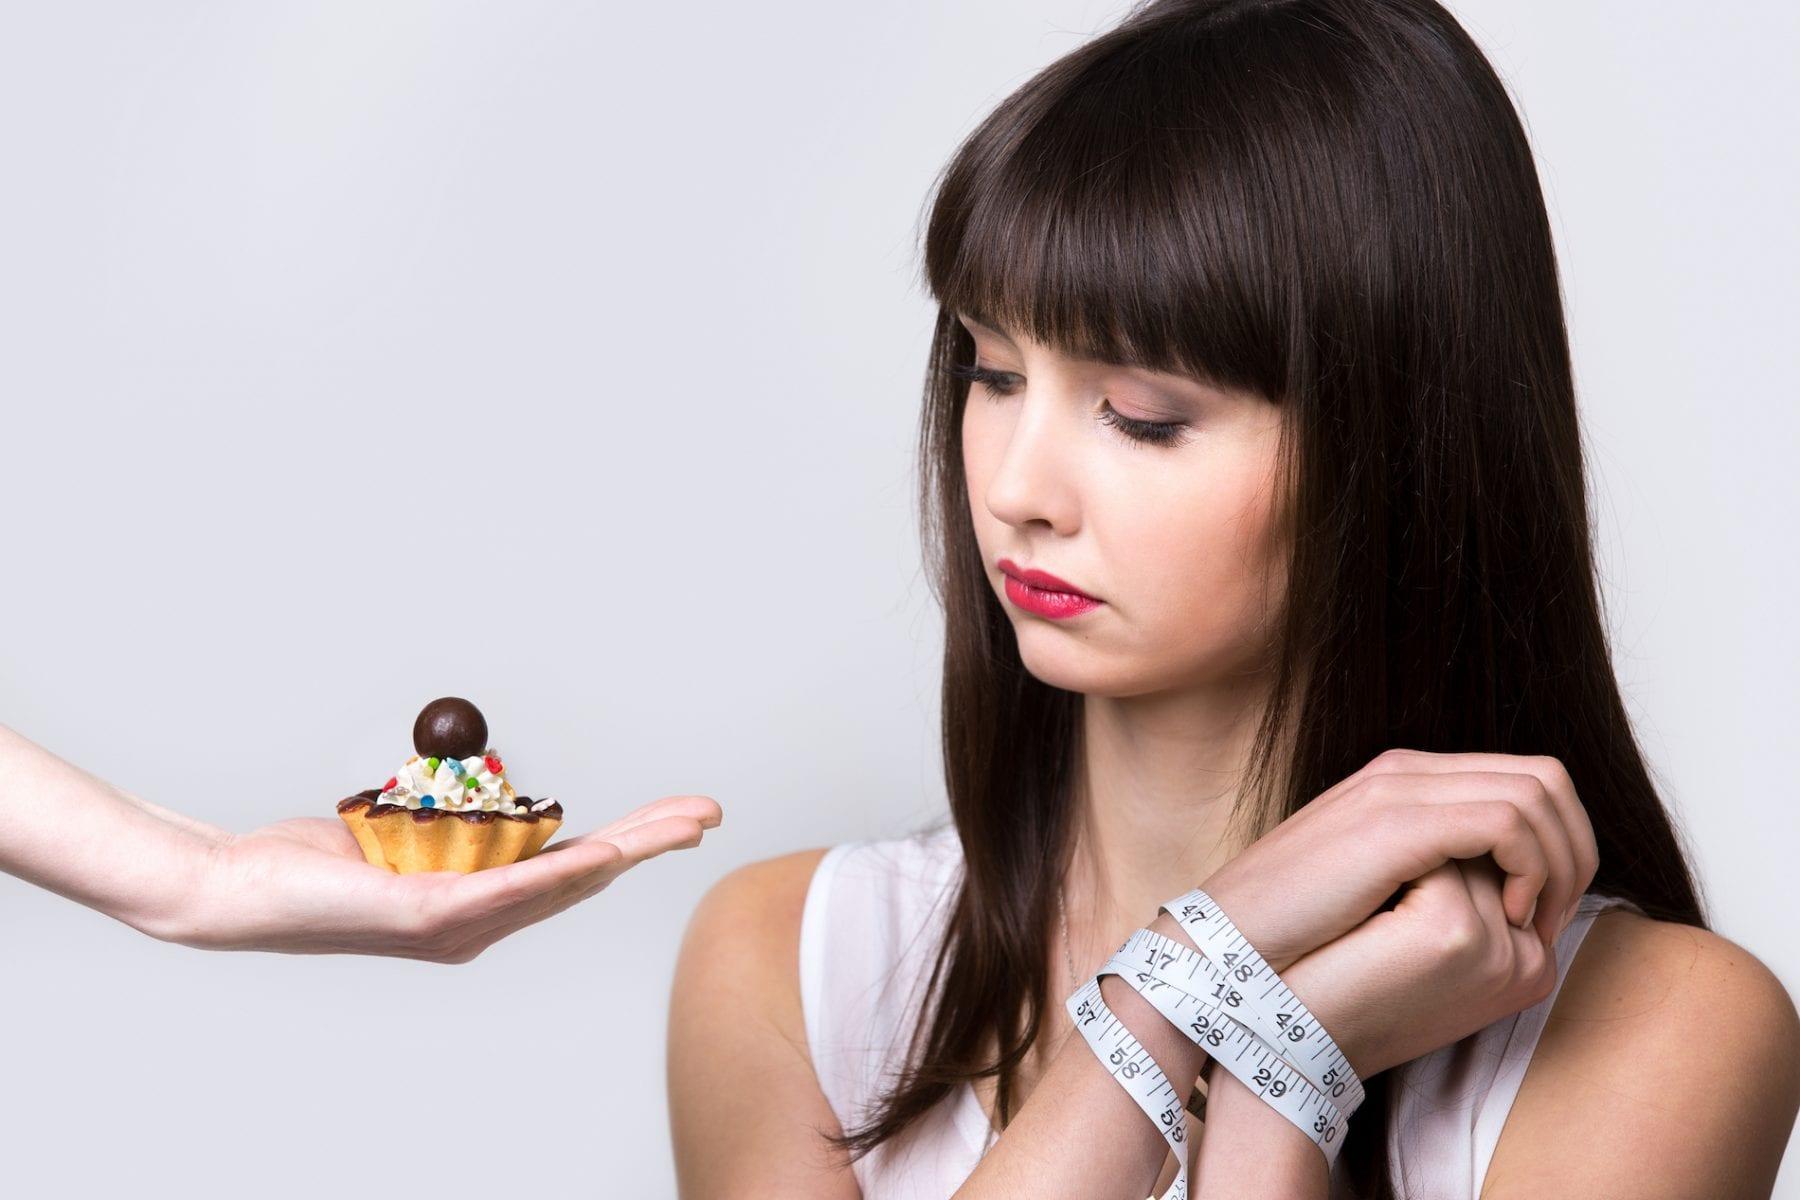 intuitiv spisning